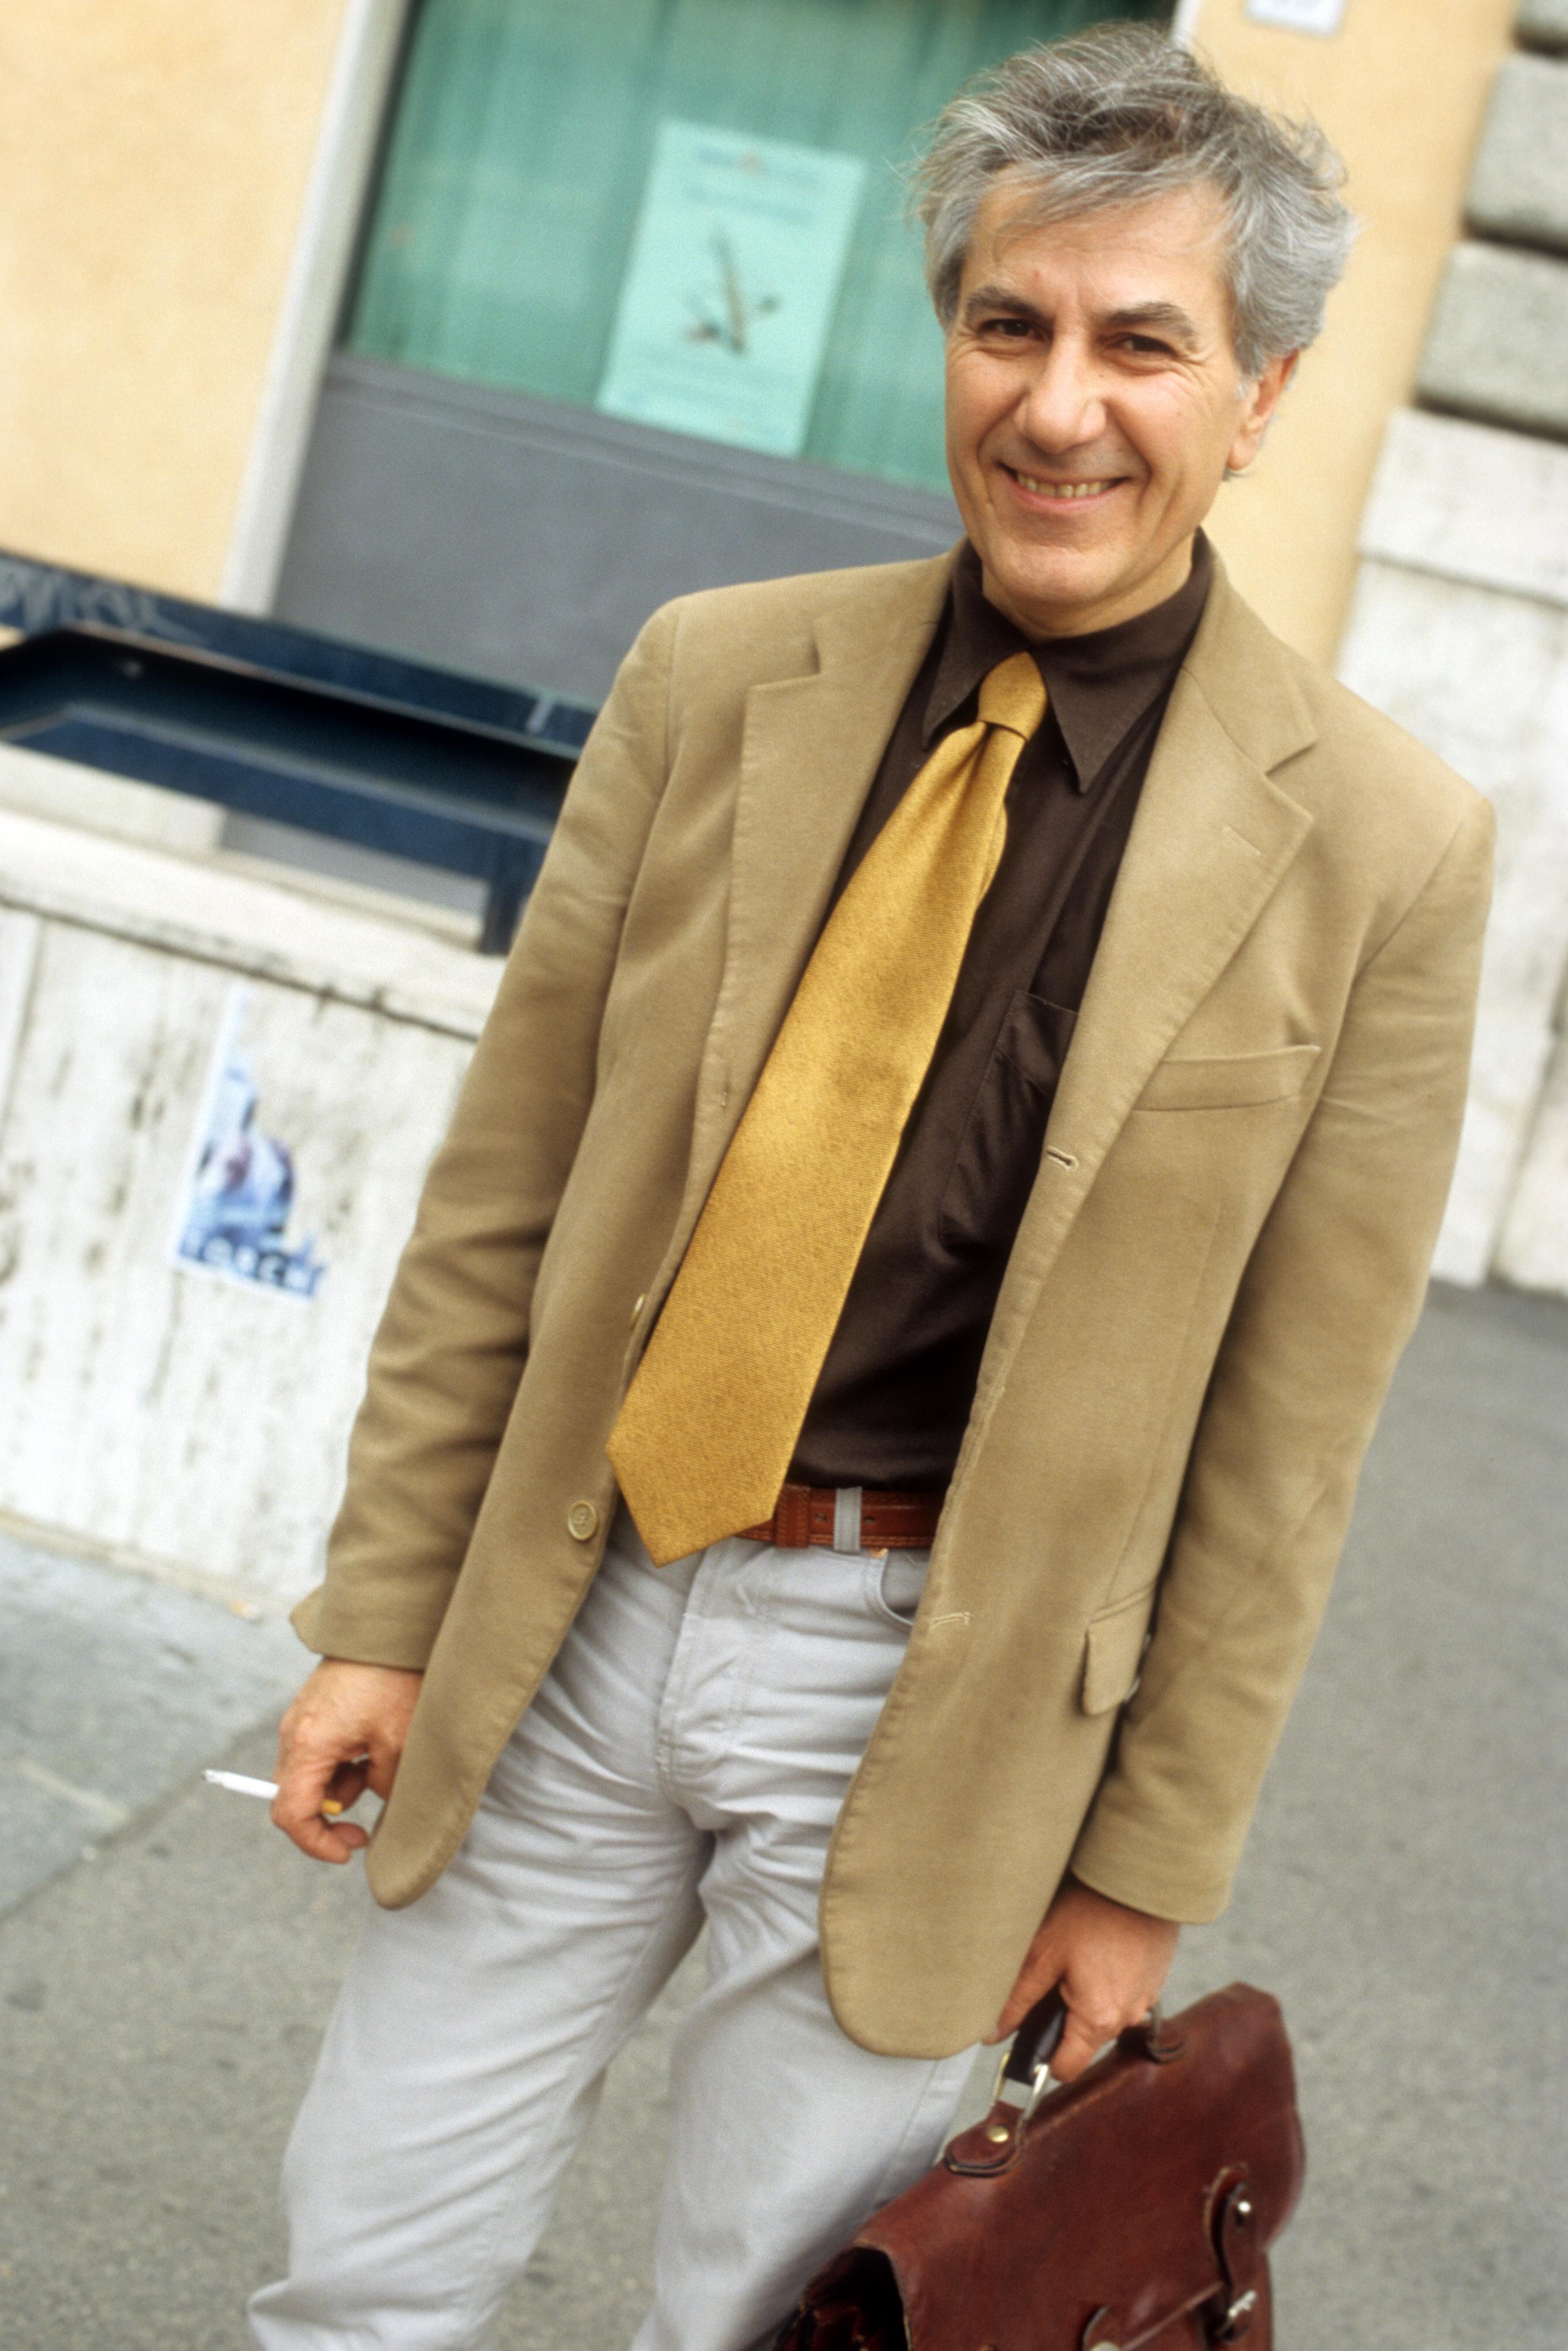 ItalyBusinessMan.jpg